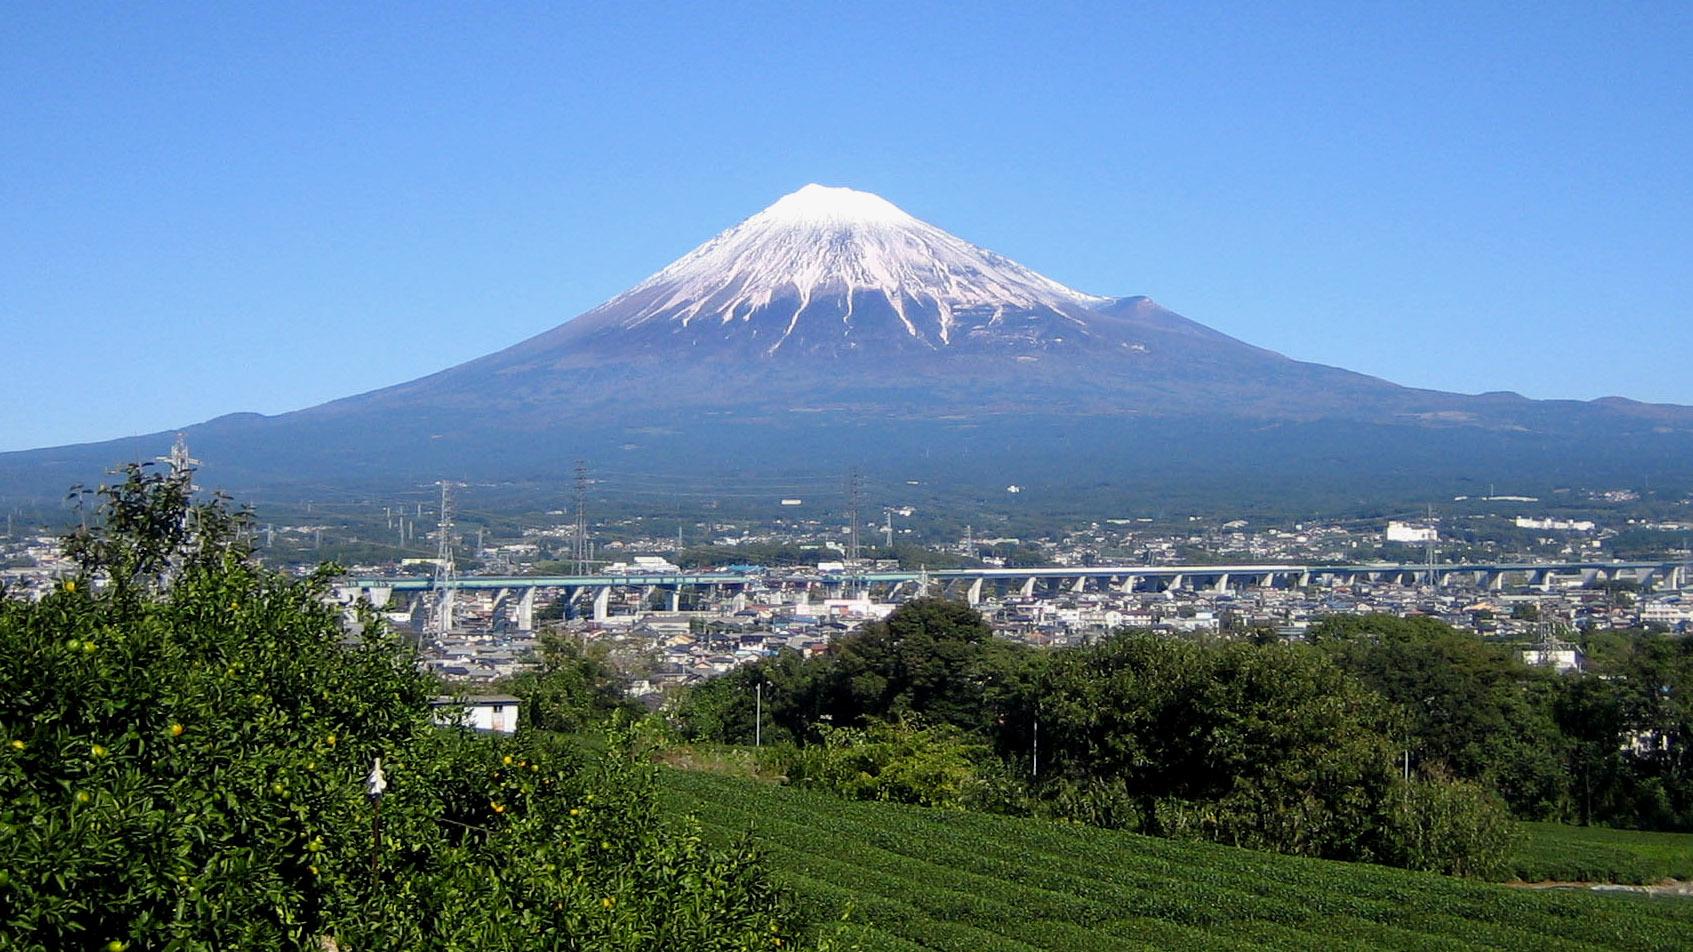 جبل فوجي ويكيبيديا